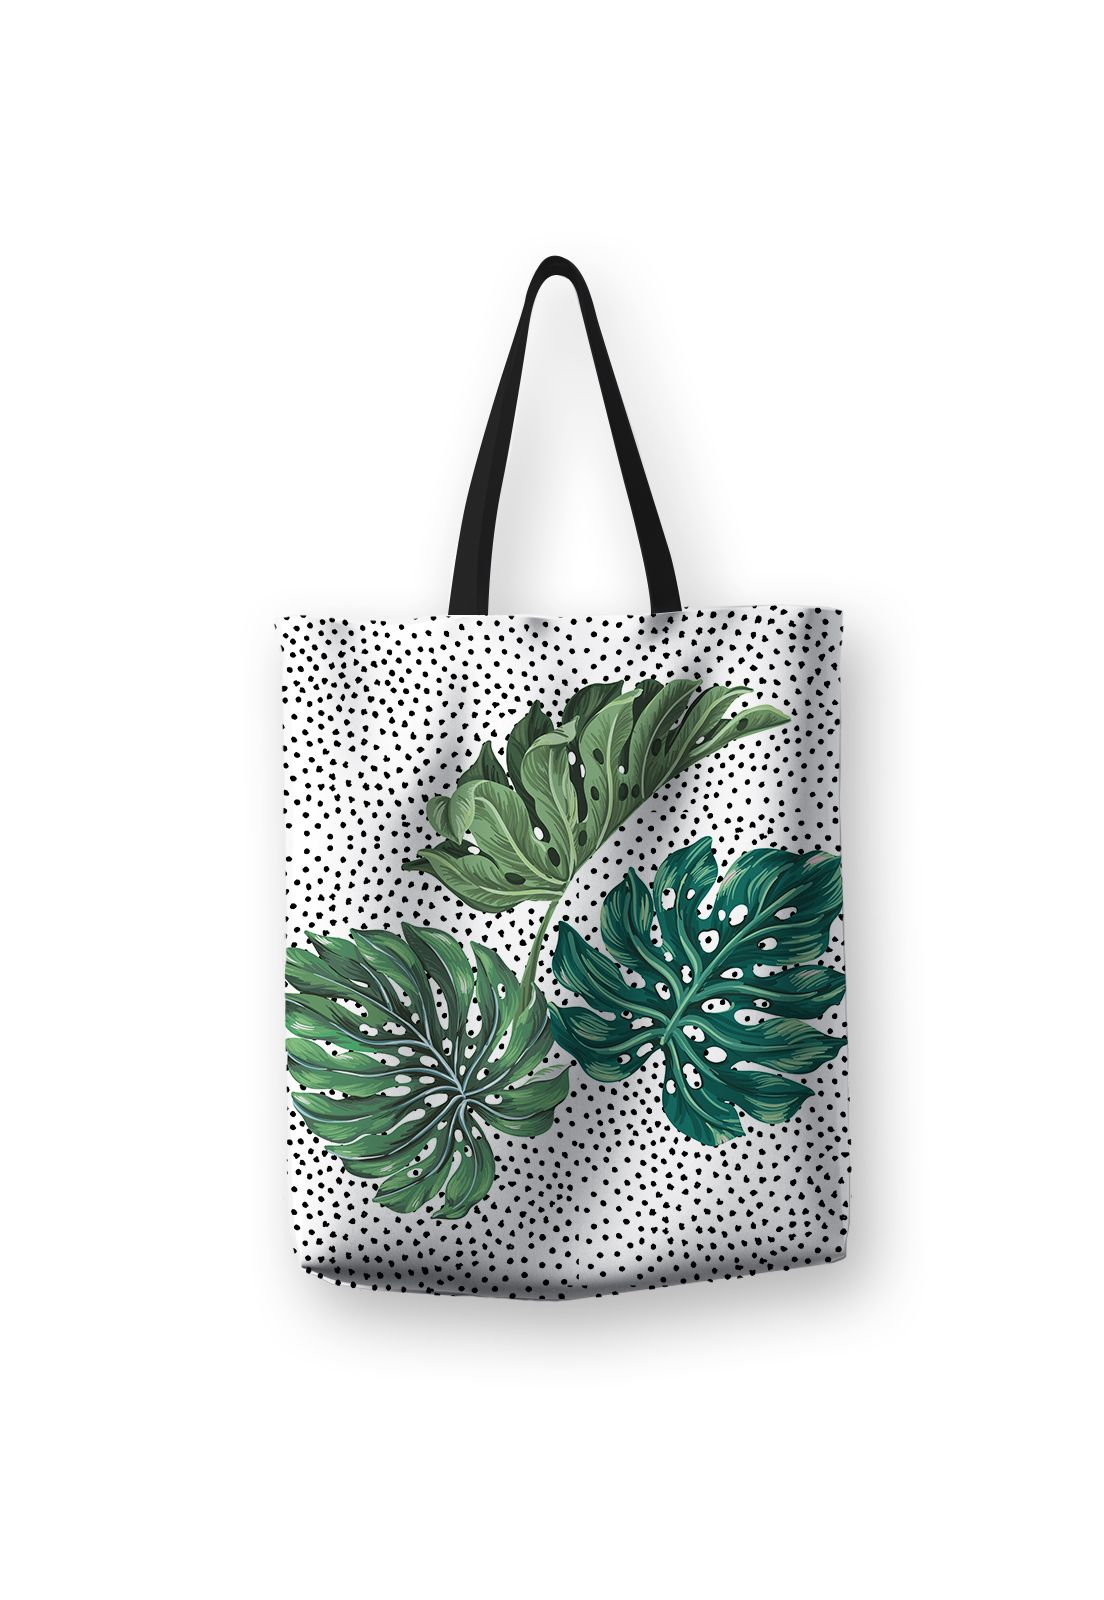 Tote Bag Plants